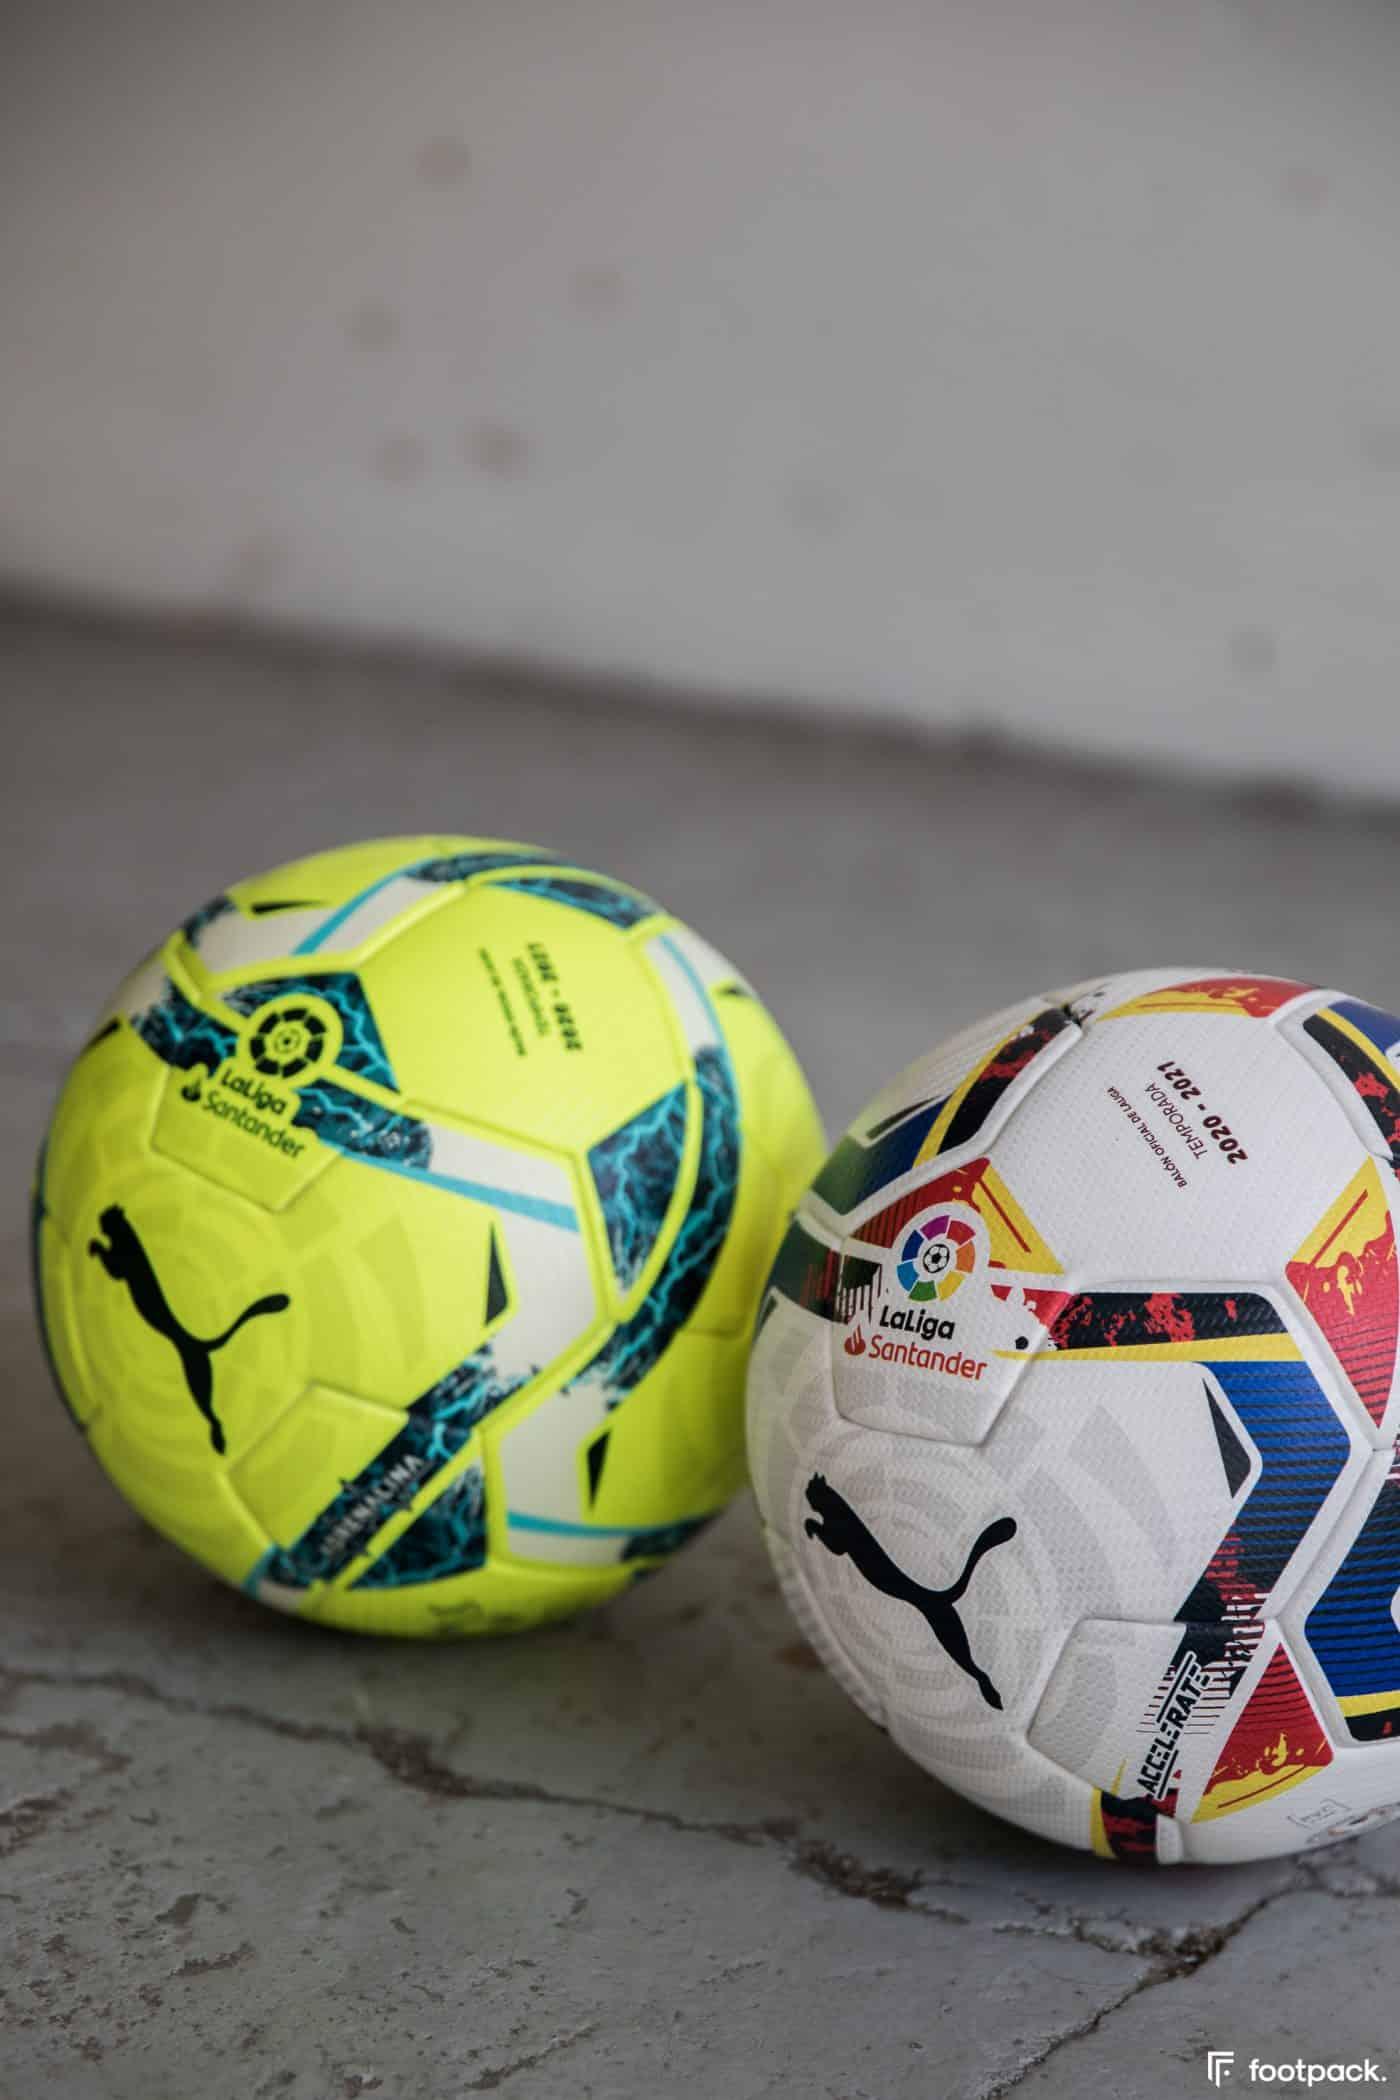 ballon-championnat-espagne-la-liga-2020-2021-puma-footpack-15